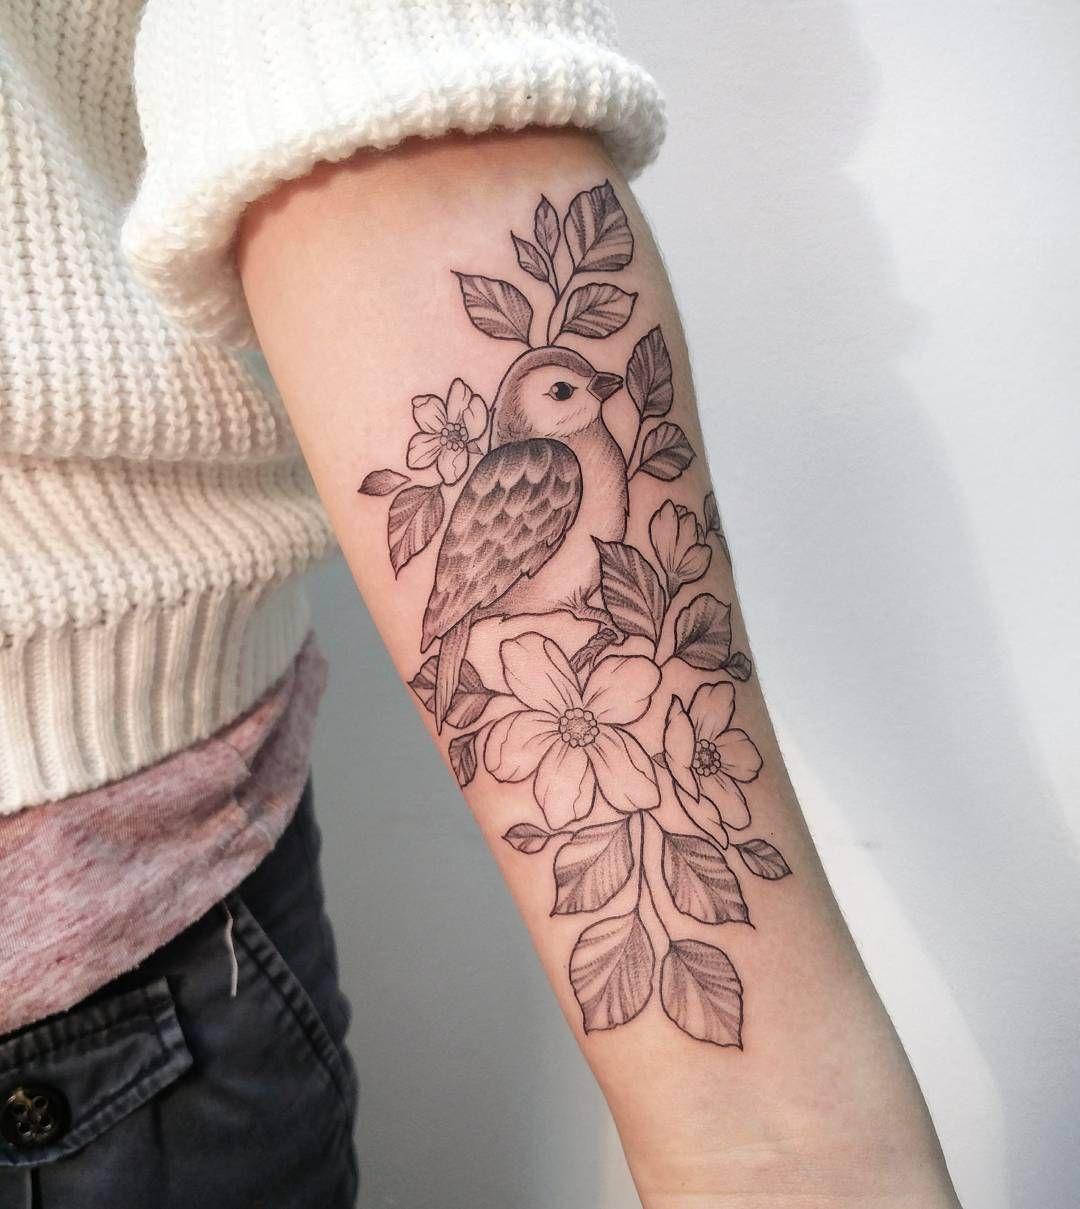 Forearm Feminine Bird Tattoo Irene Bogachuk Tattoos Irene for sizing 1080 X 1209